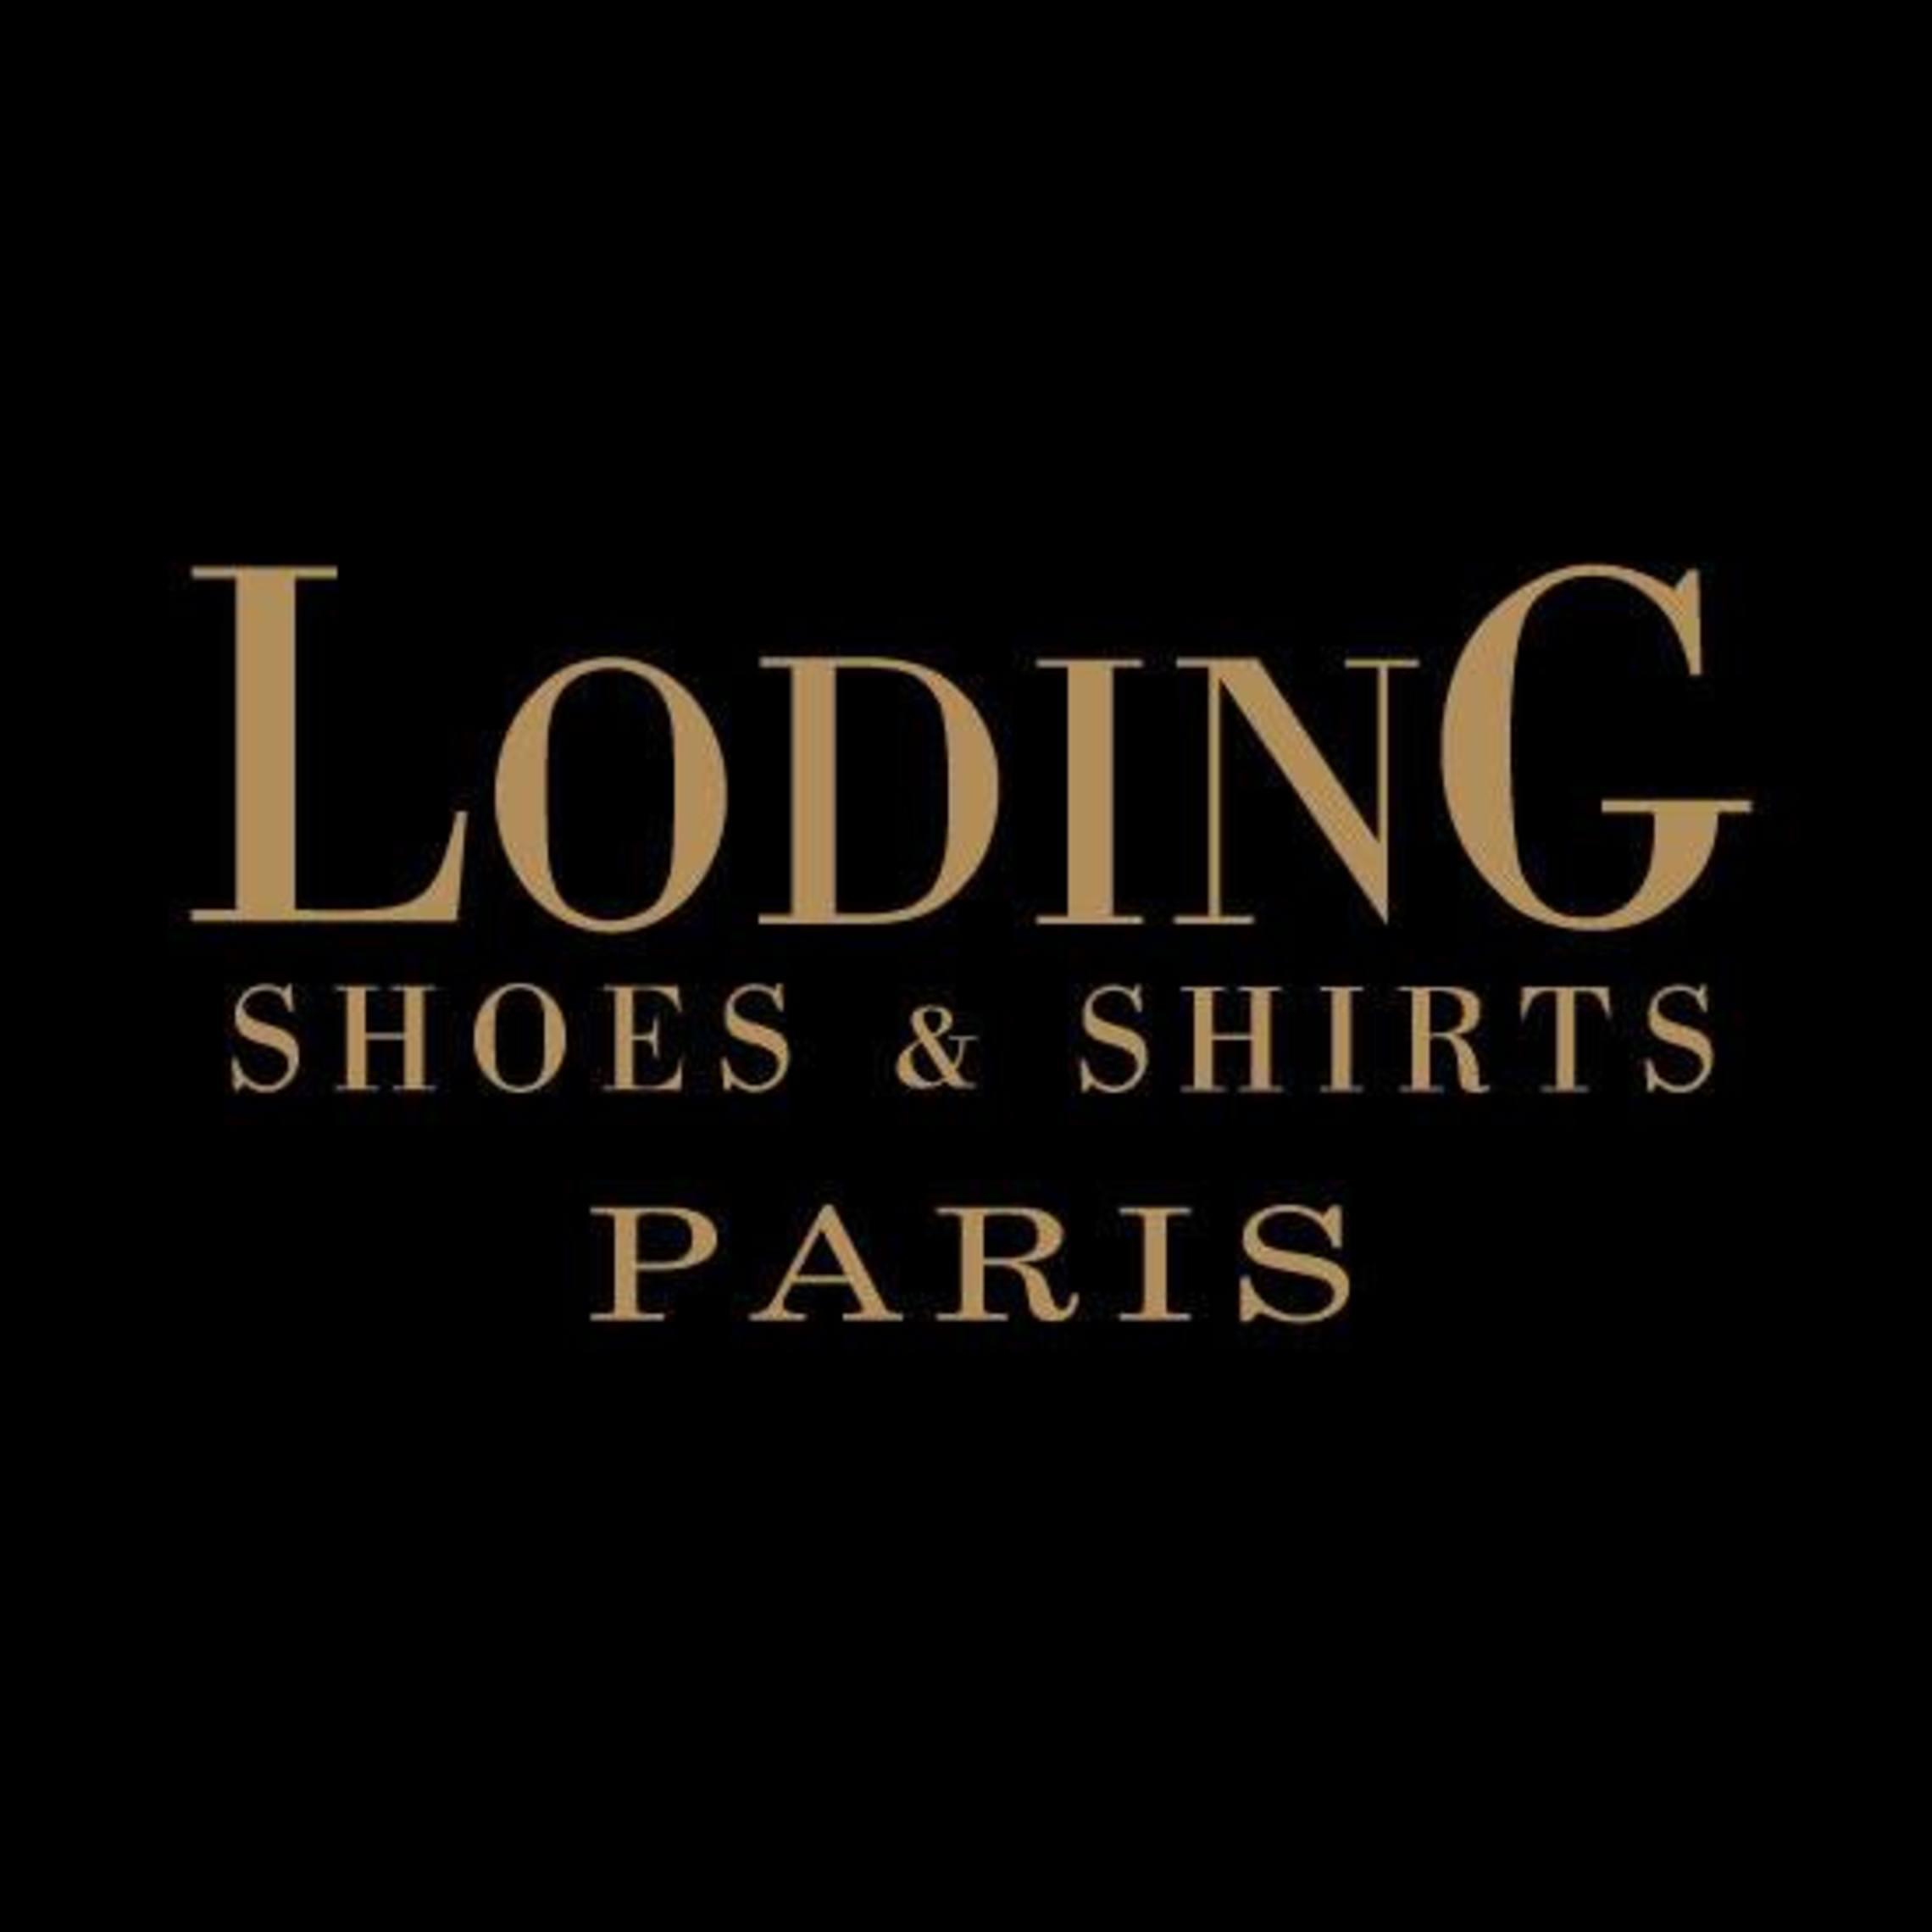 loding paris hong- company logo